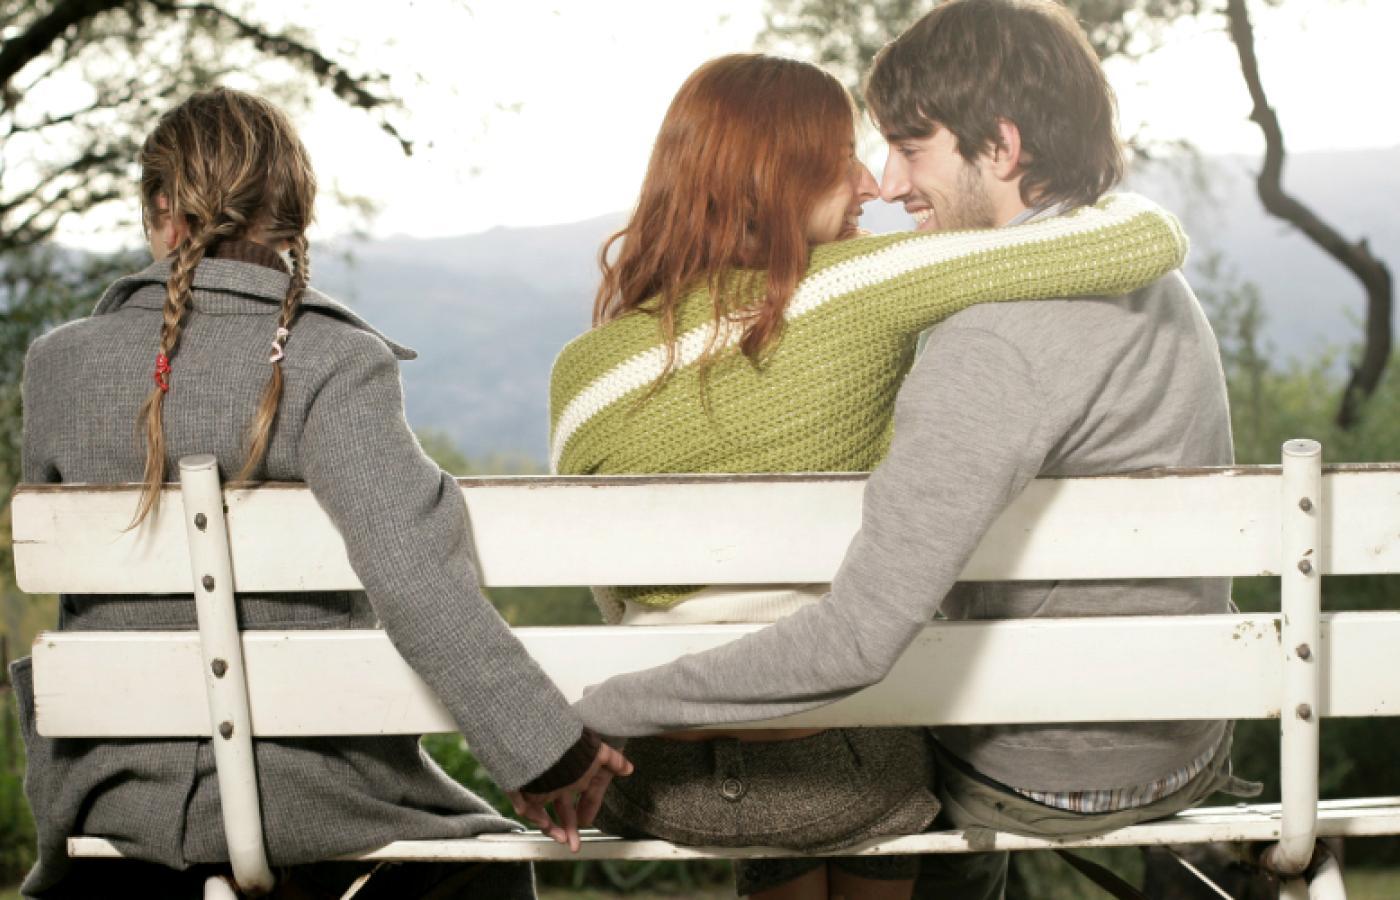 oszustwa randkowe malezja